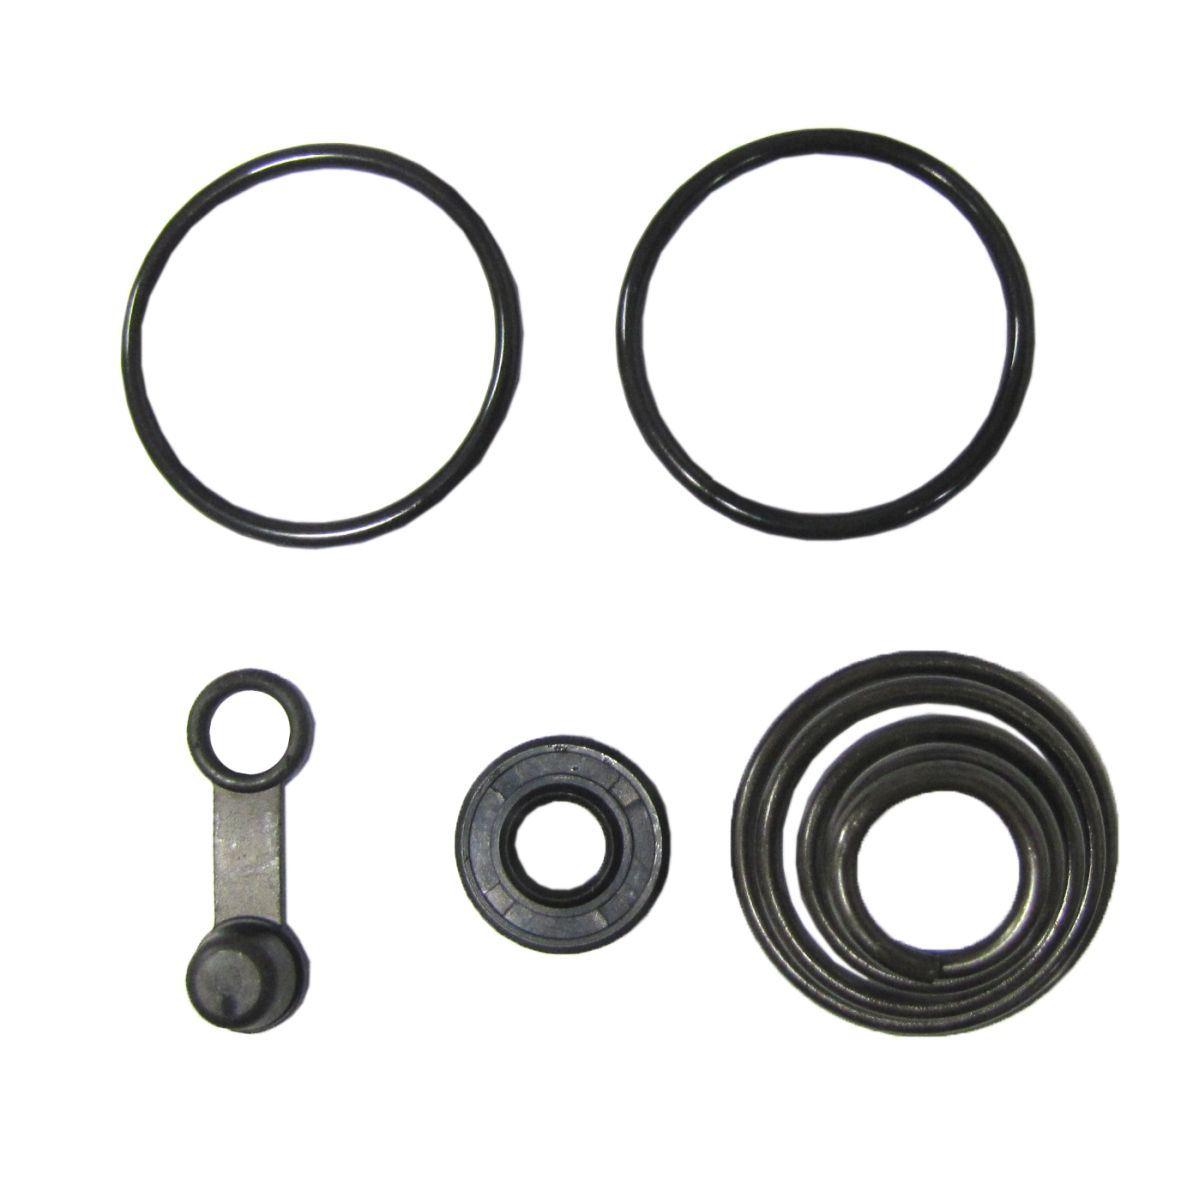 AW Motorcycle Parts. Clutch Slave Kit Honda CBF1000 06-10